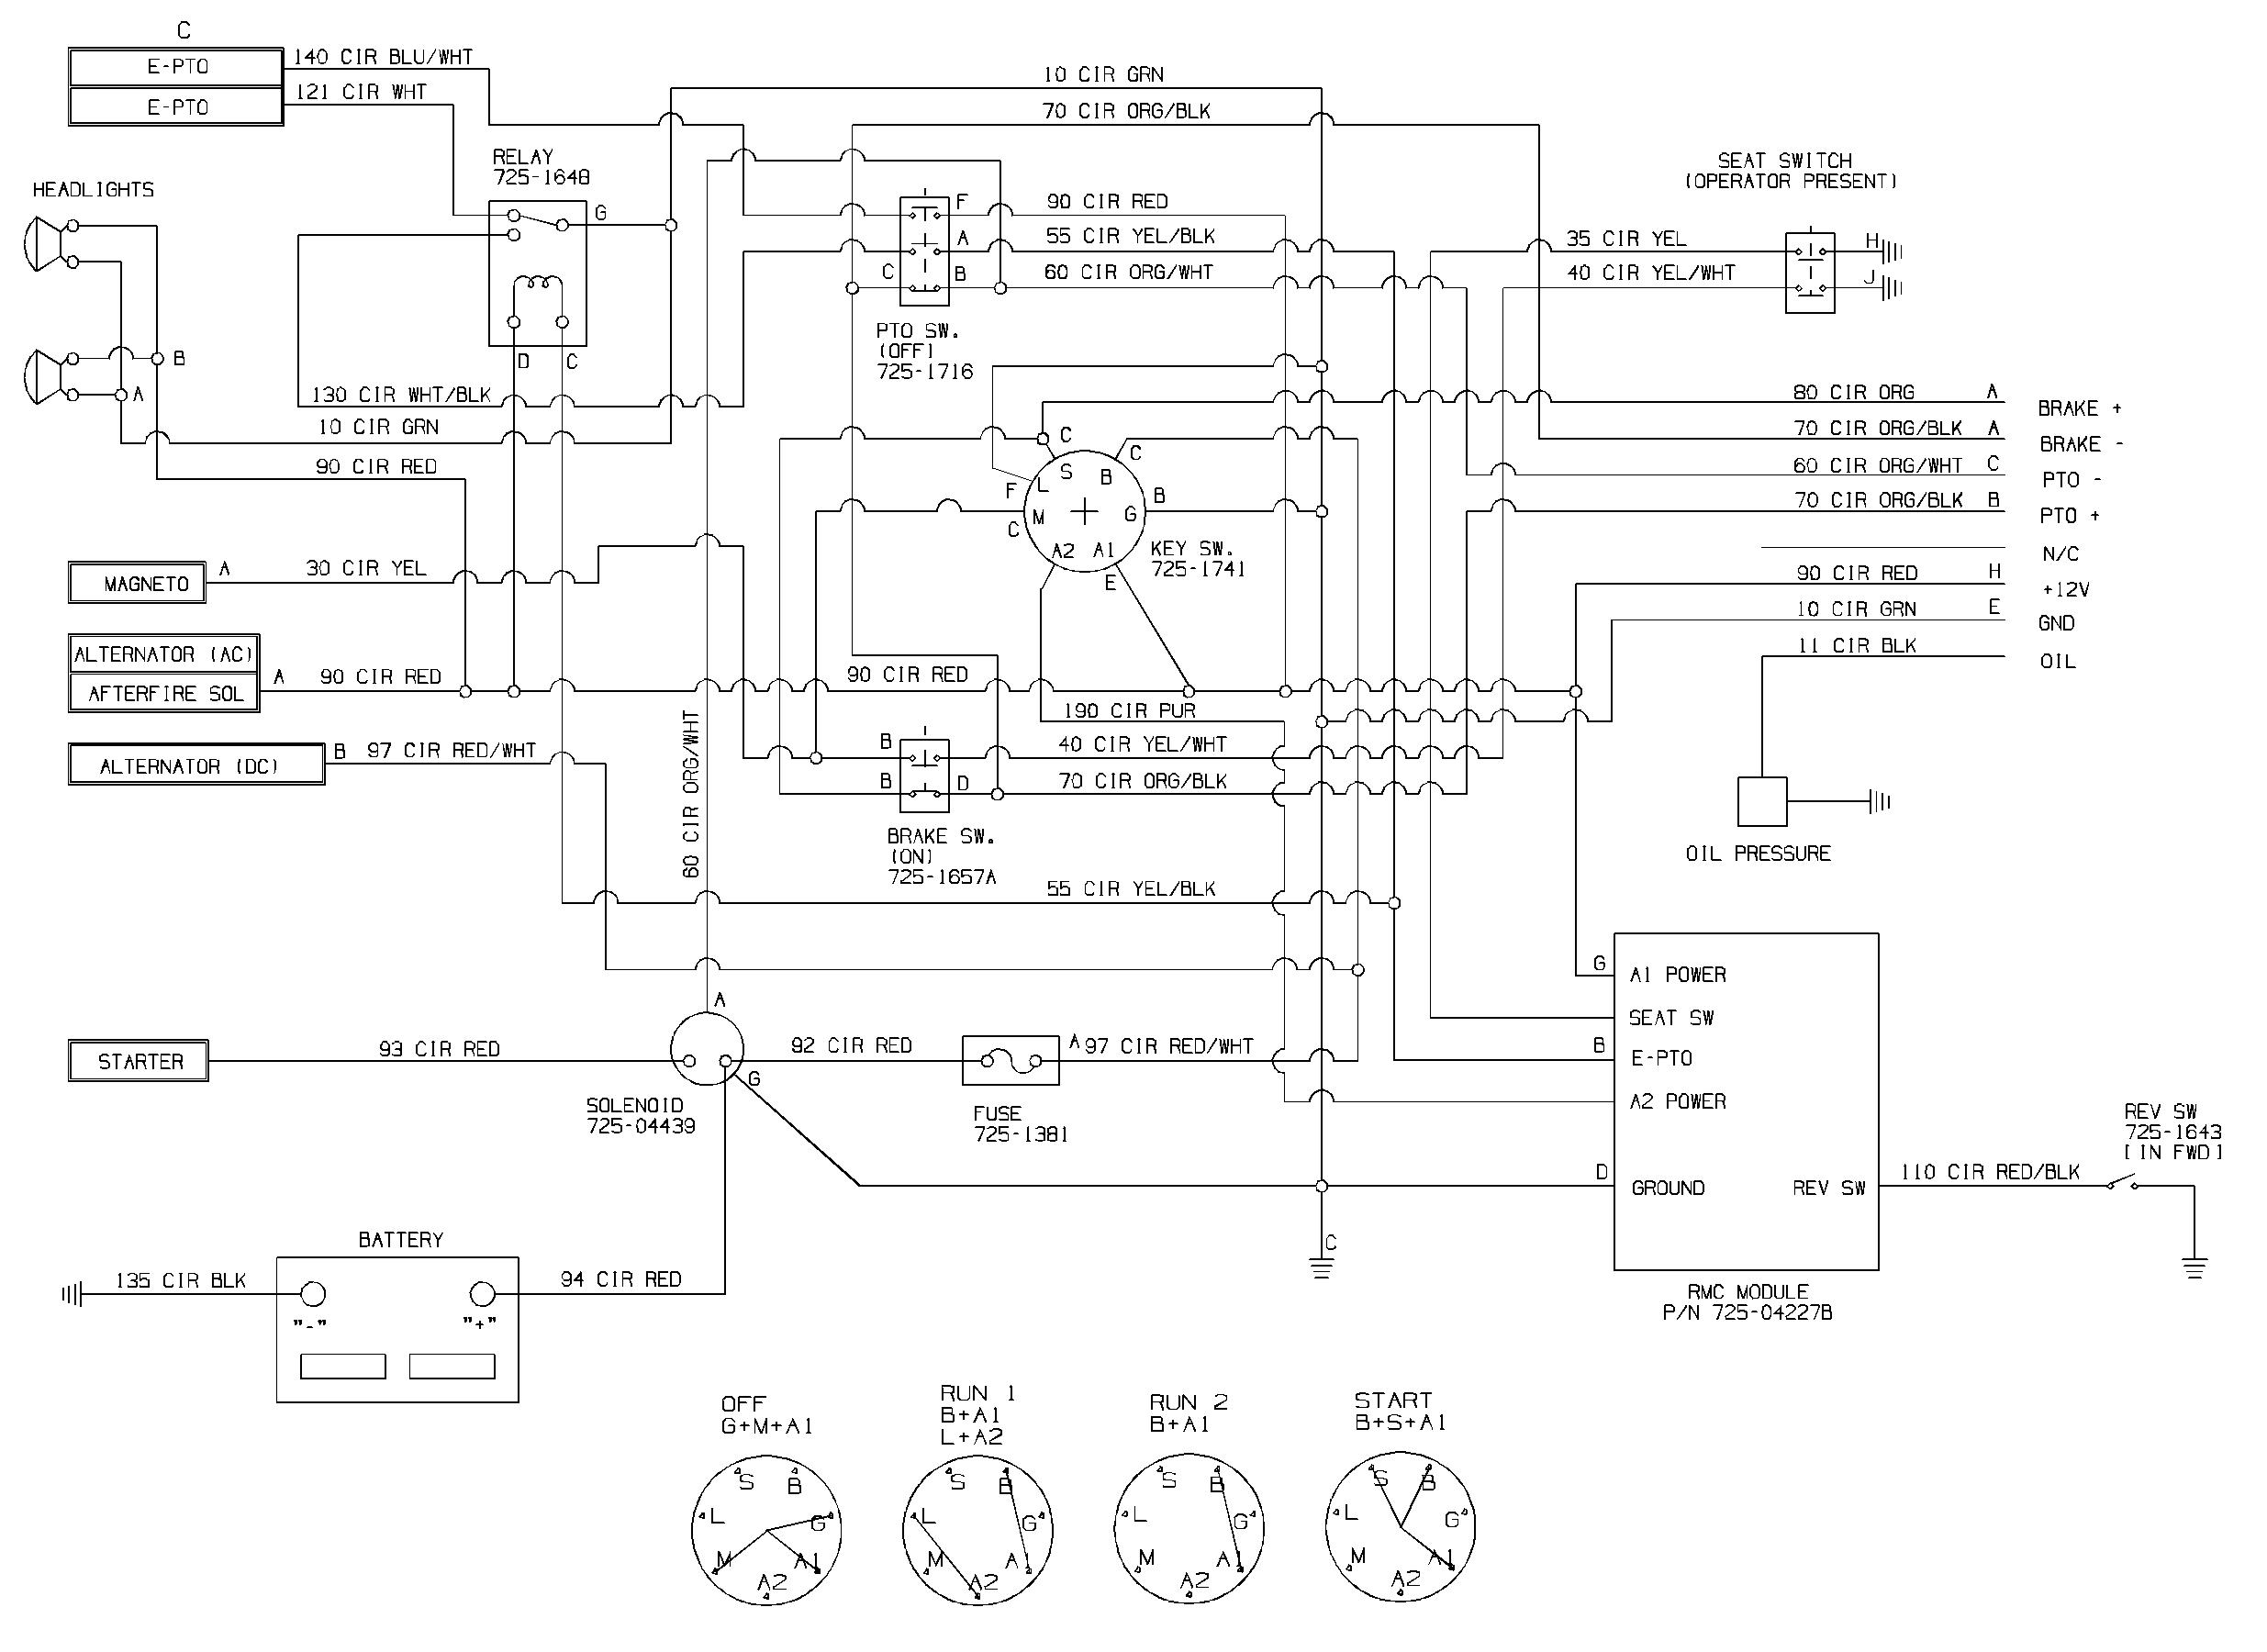 Wiring Diagram For Cub Cadet 1210